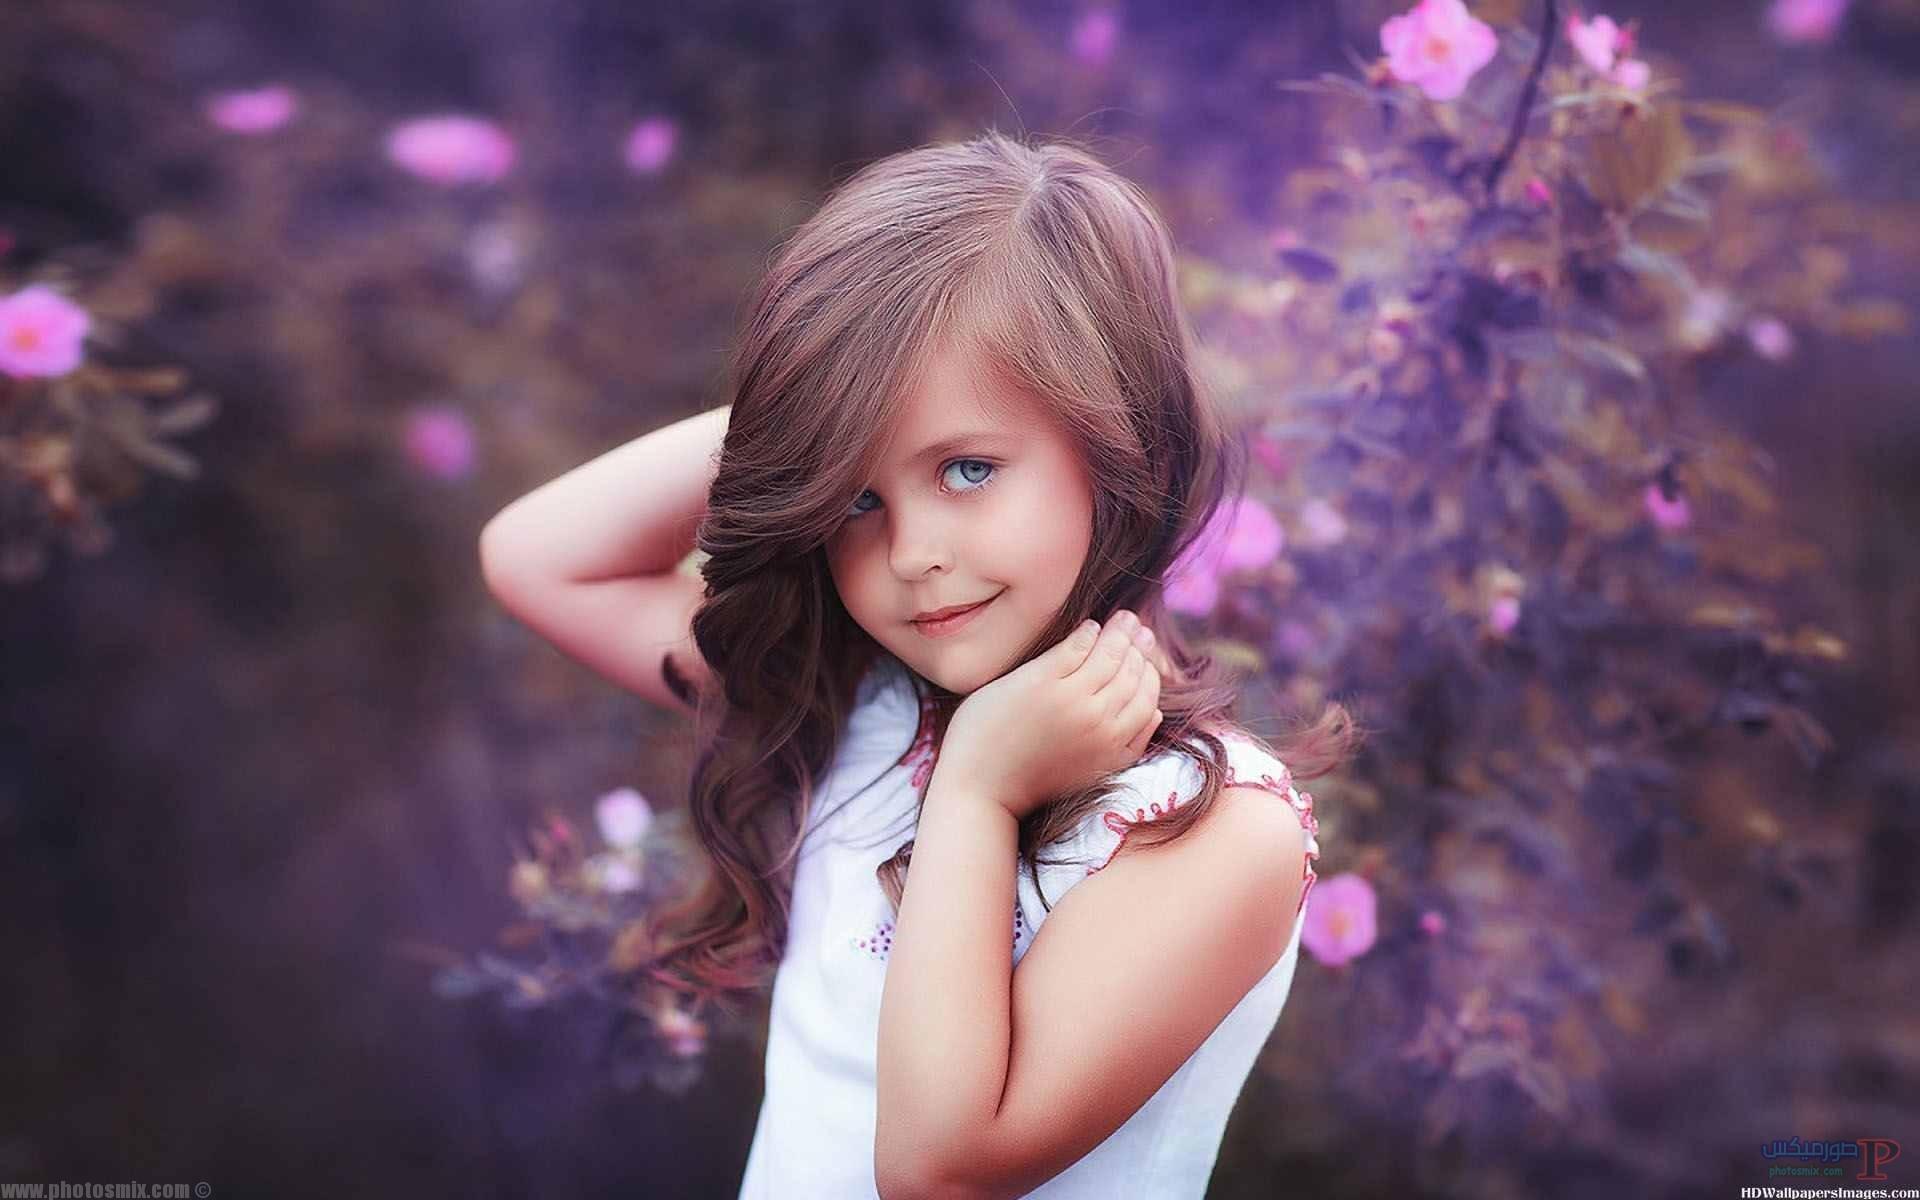 -صور-بنات-كيوت-2 صور أطفال صغار, اجمل صور بيبي, صور اطفال بغمازات, صور أطفال 2018